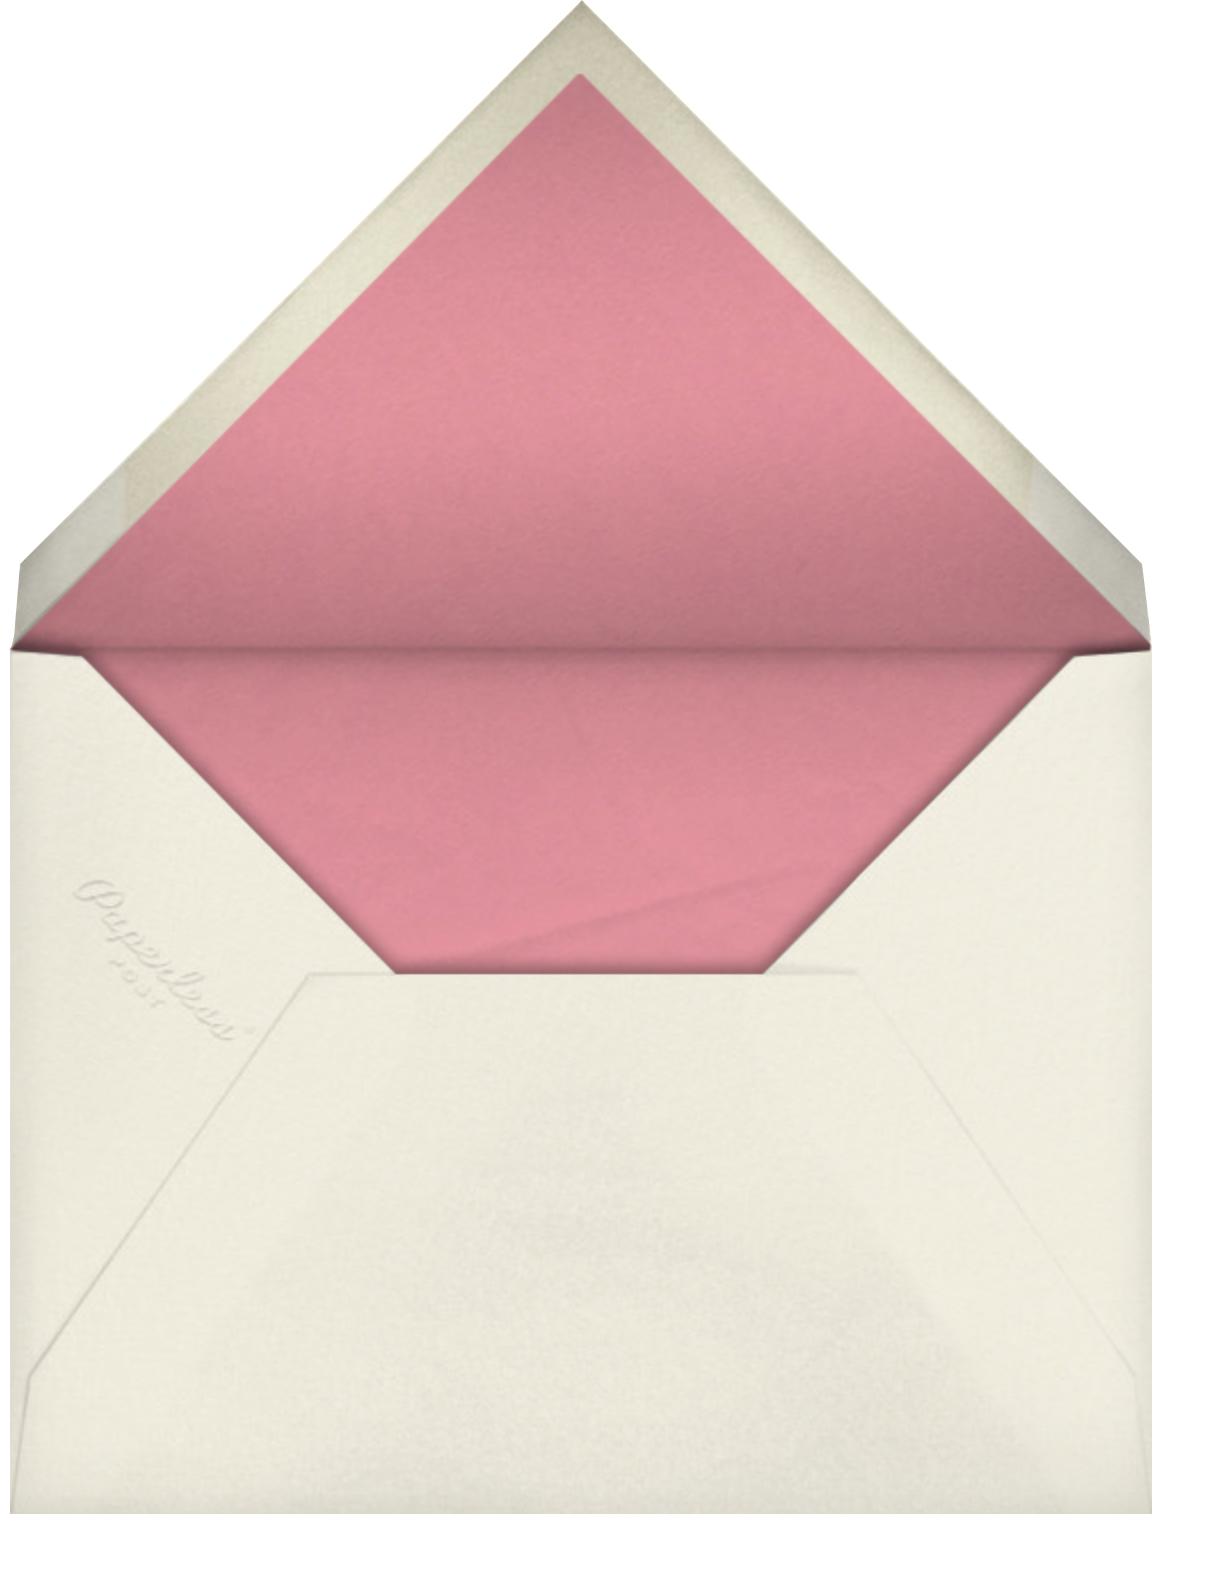 Mumsy - Meadow - Anthropologie - Brunch - envelope back